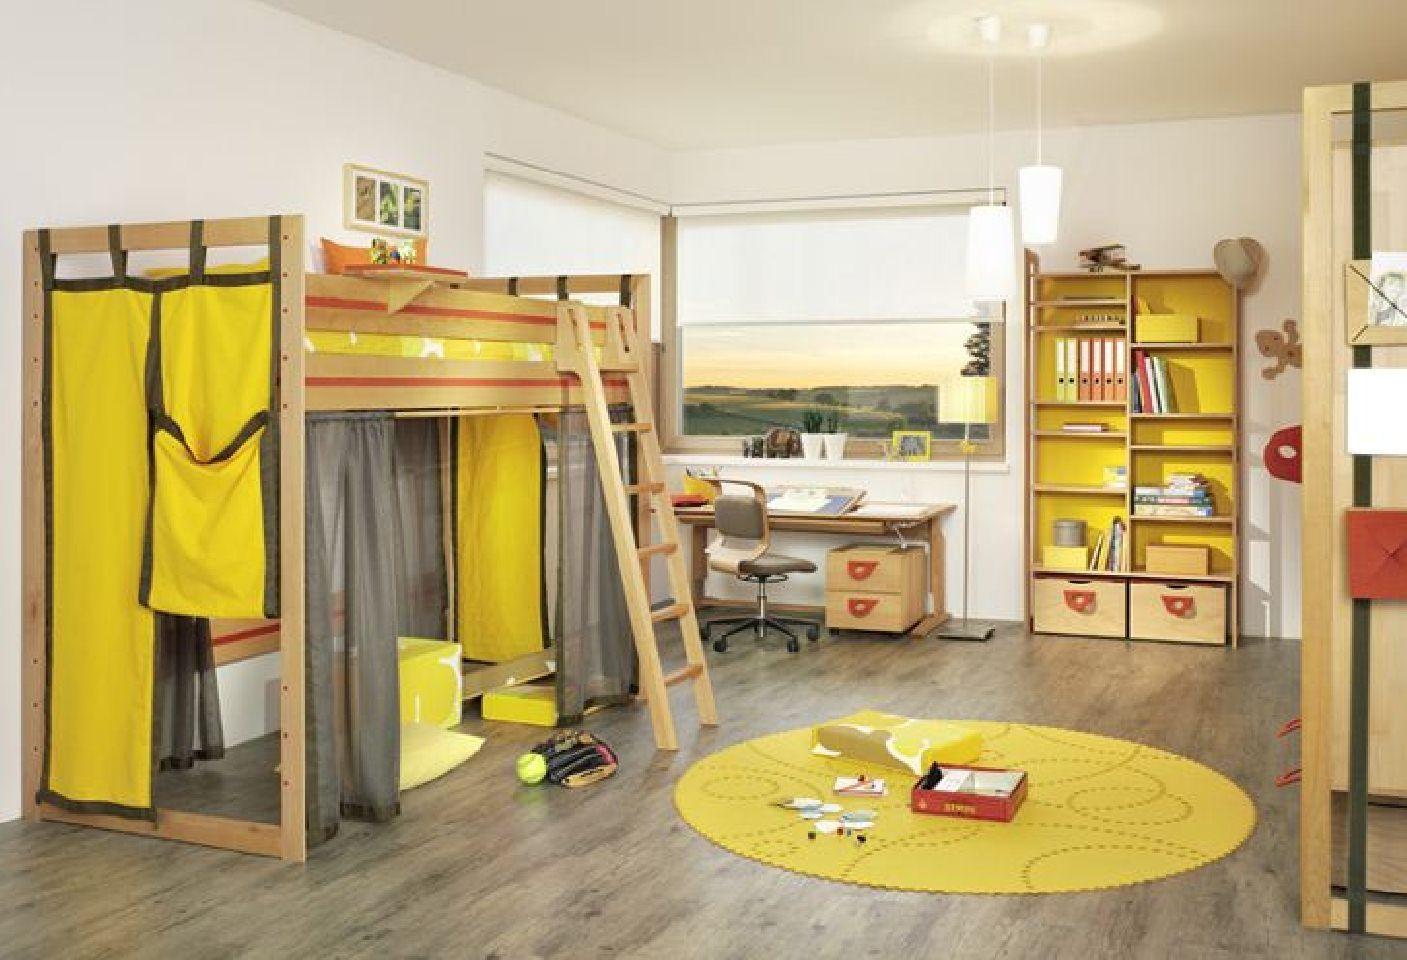 Boys Bedrooms Designs Unique Funky Kids Rooms With Tweaks Of Yellow  Bedroom Decor  Pinterest Decorating Inspiration